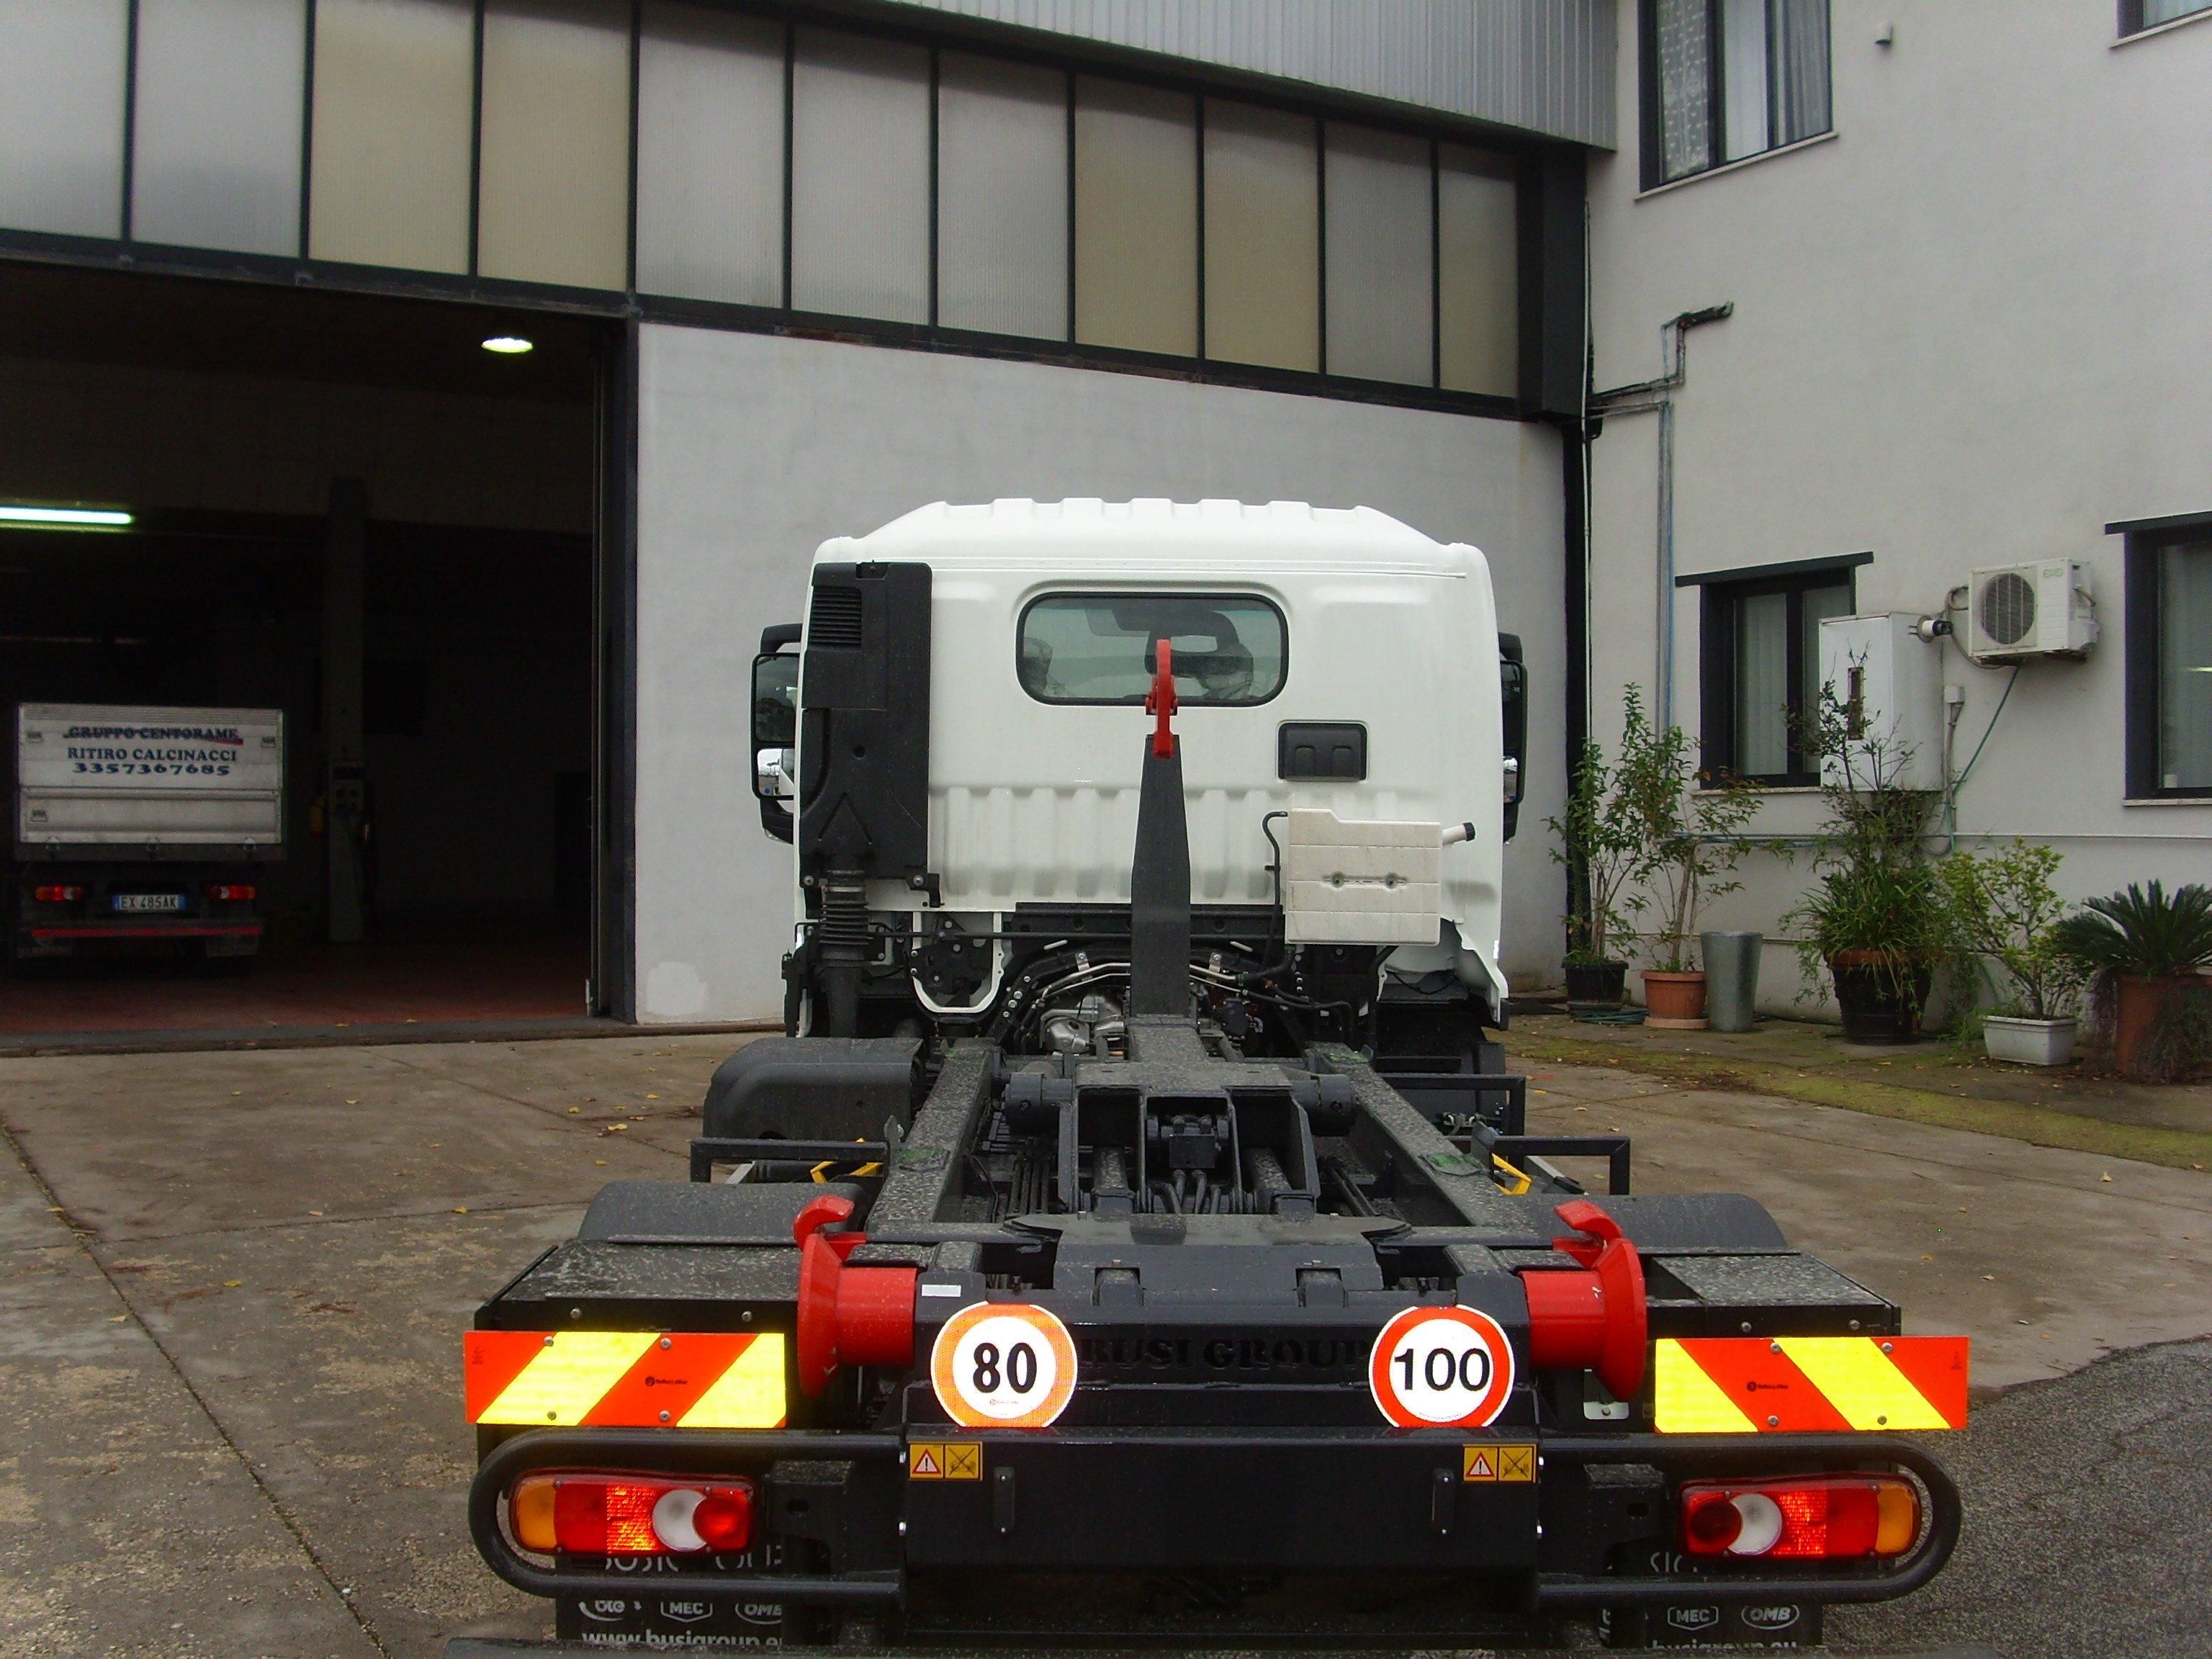 camion soccorso stradale